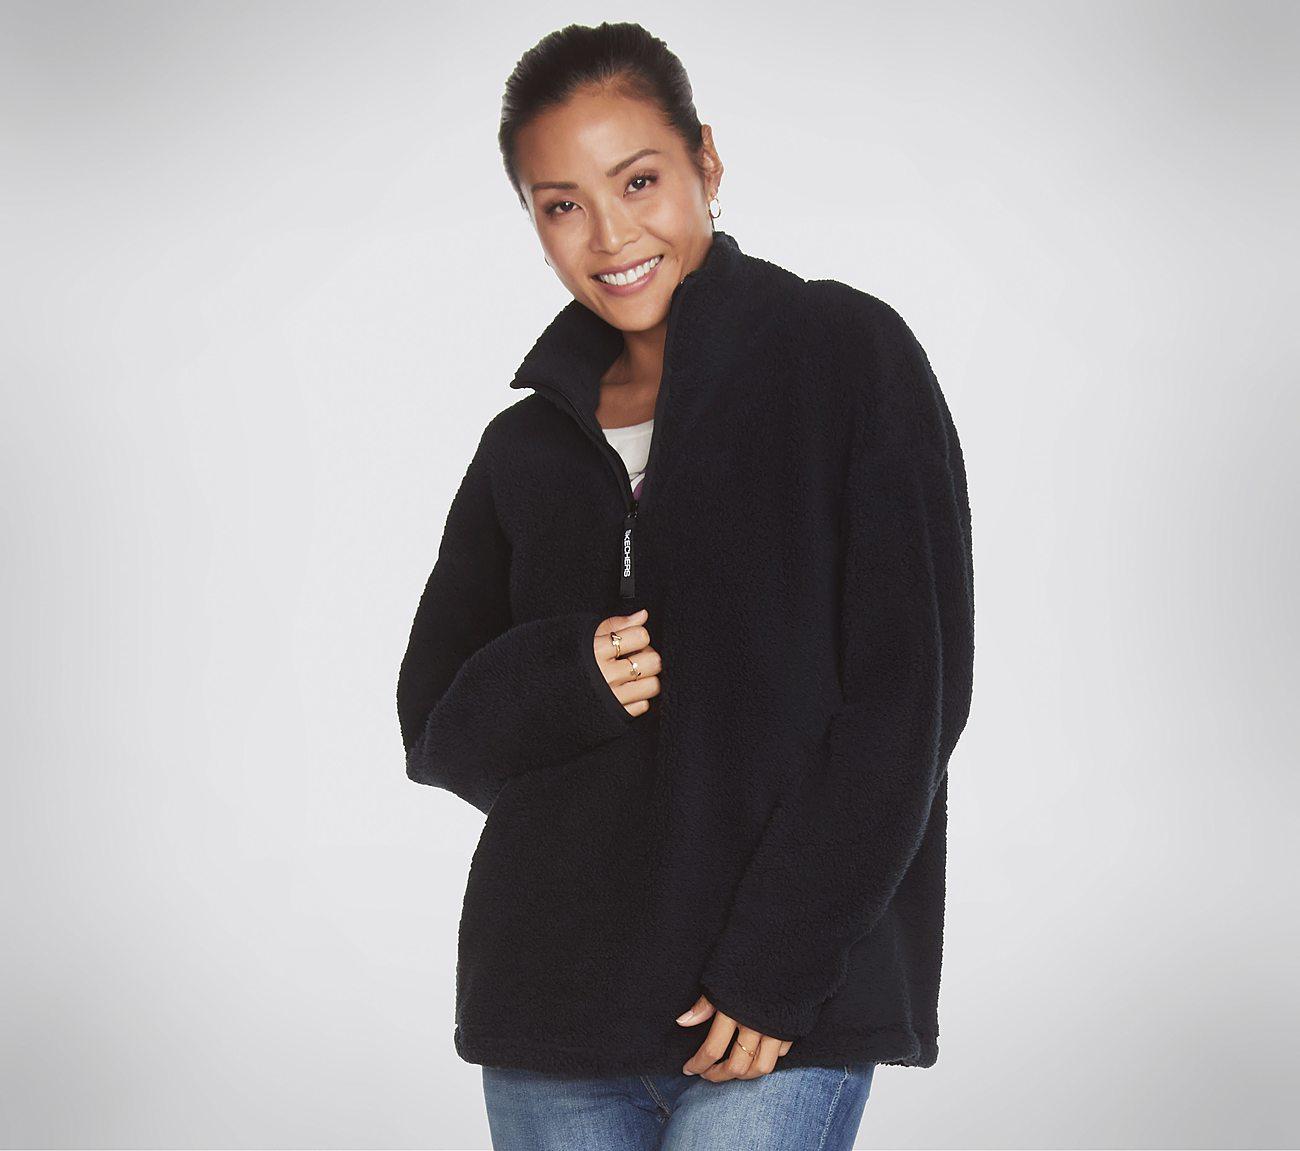 Skechers Apparel - Restful Sherpa 1/4 Zip Pullover Top